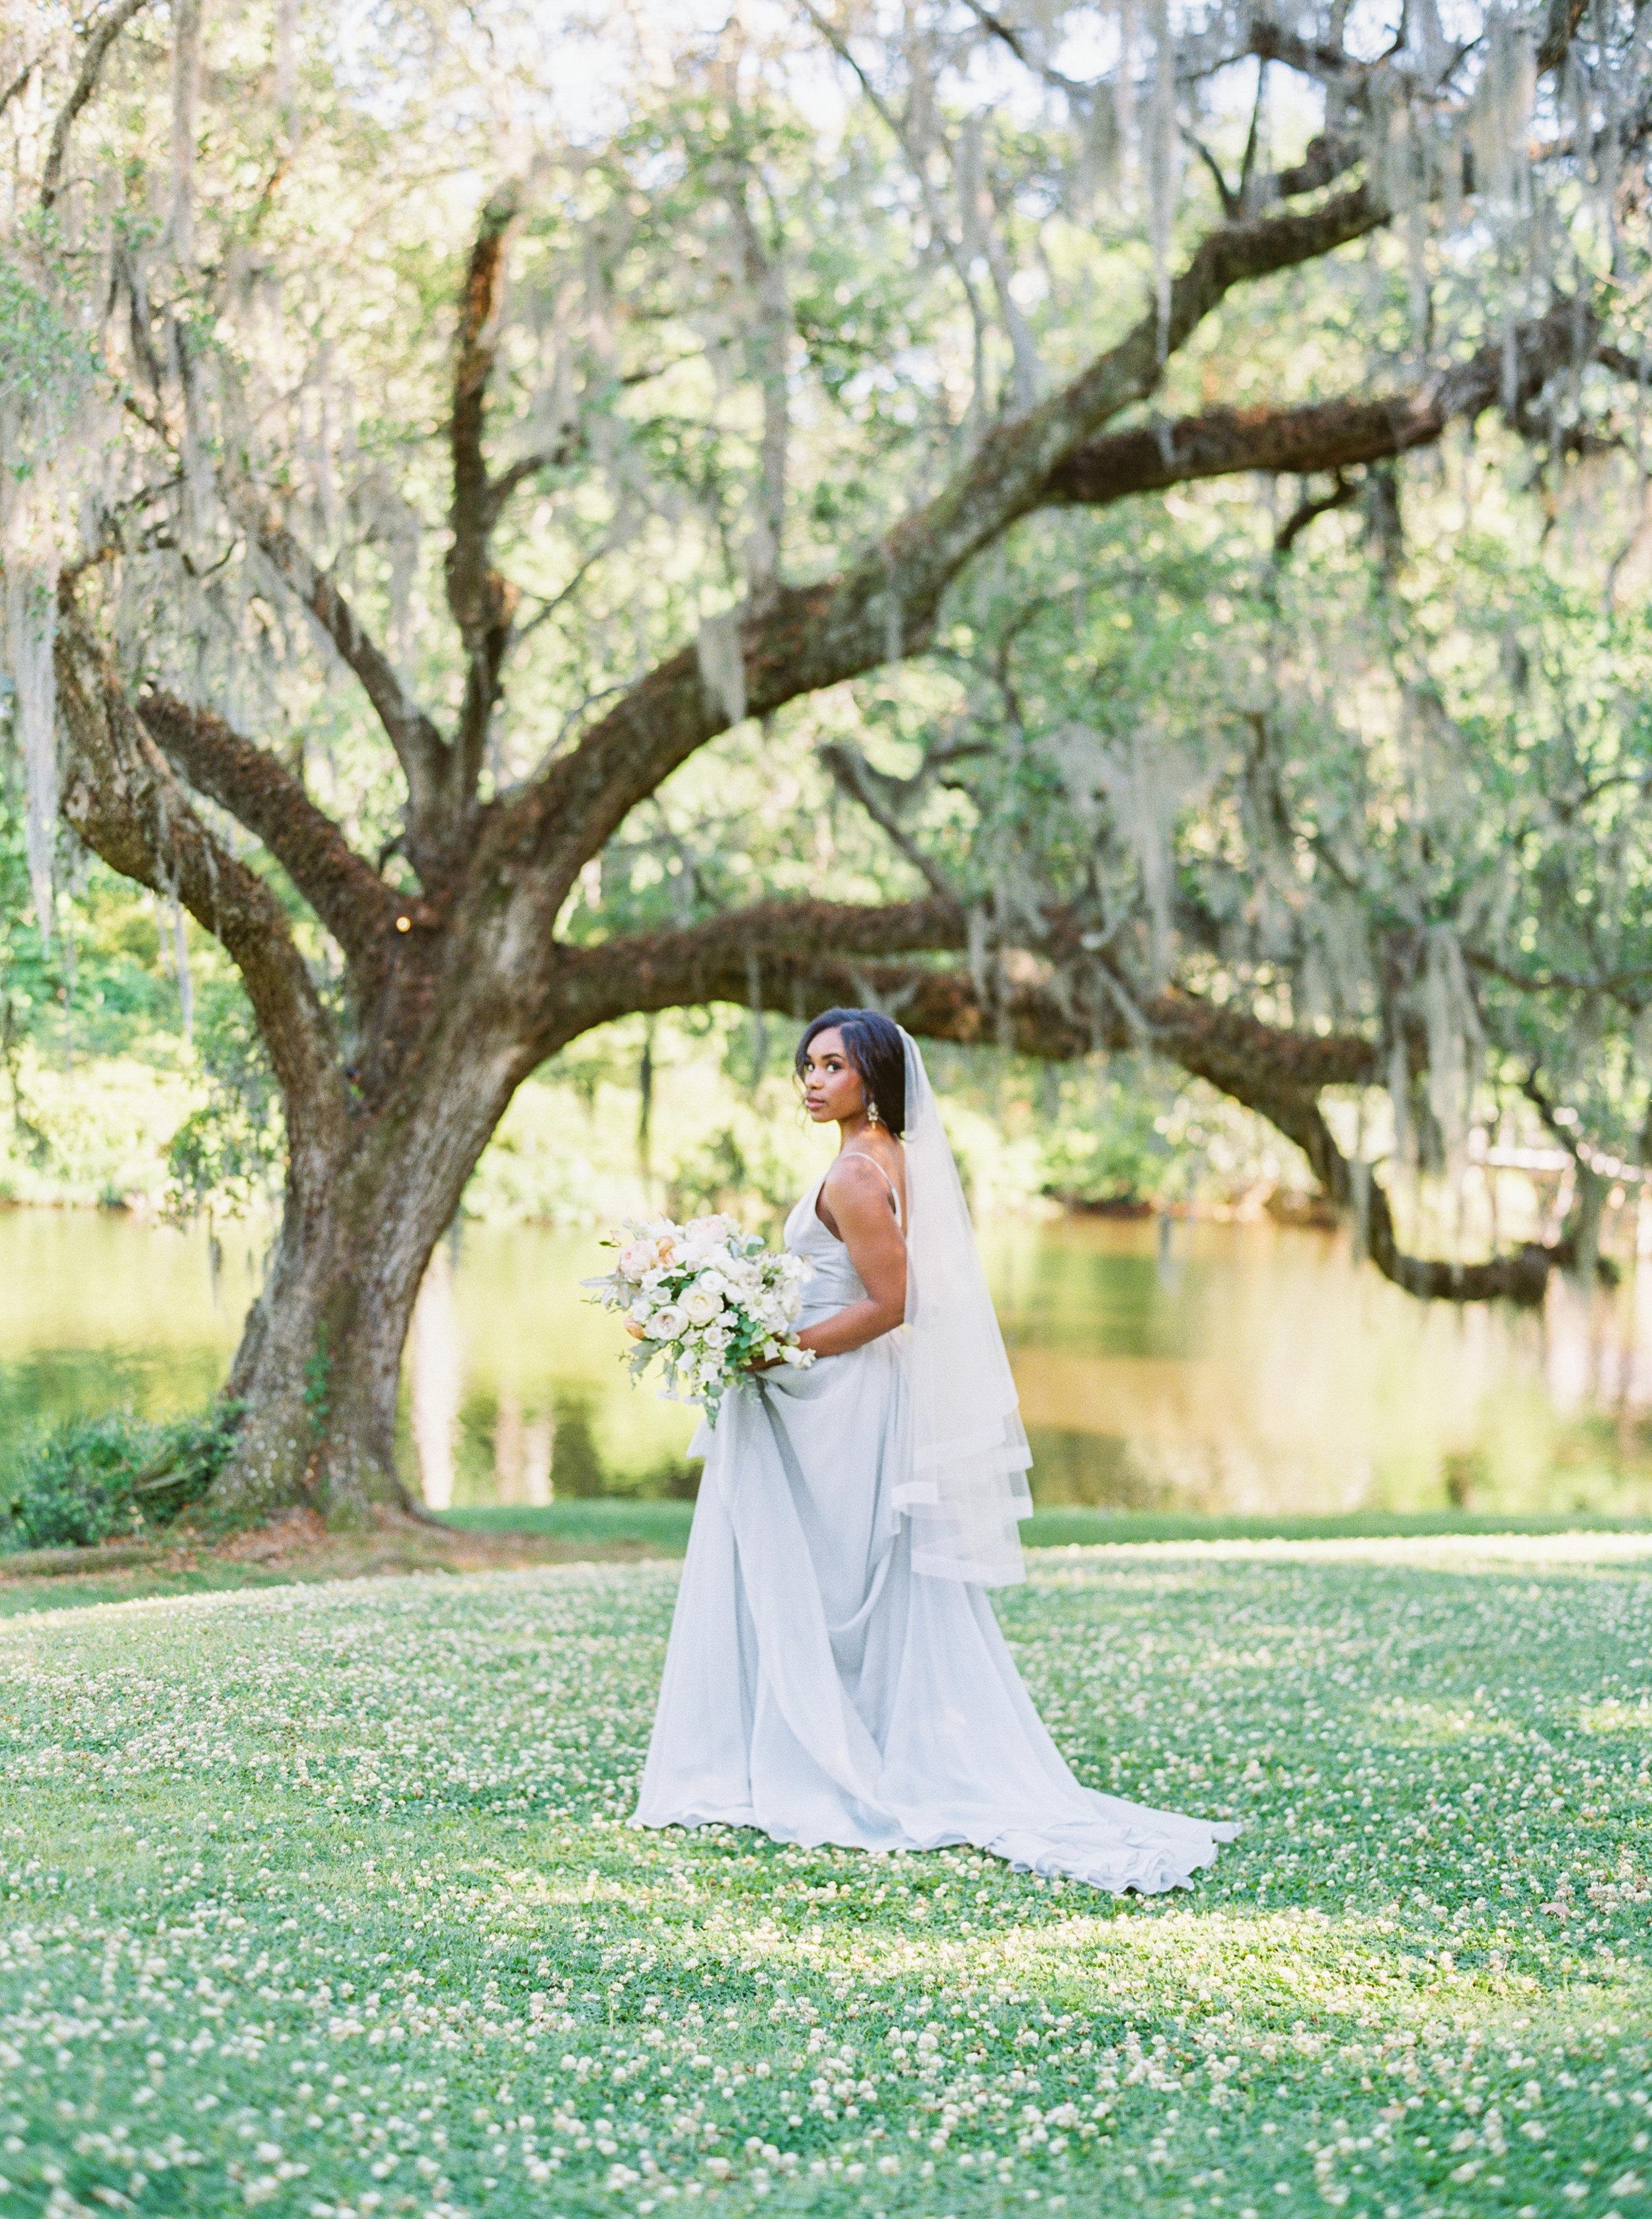 Charleston_Retreat_Kati_Rosado_Fine_Art_Film_Wedding_Photographer-54.jpg